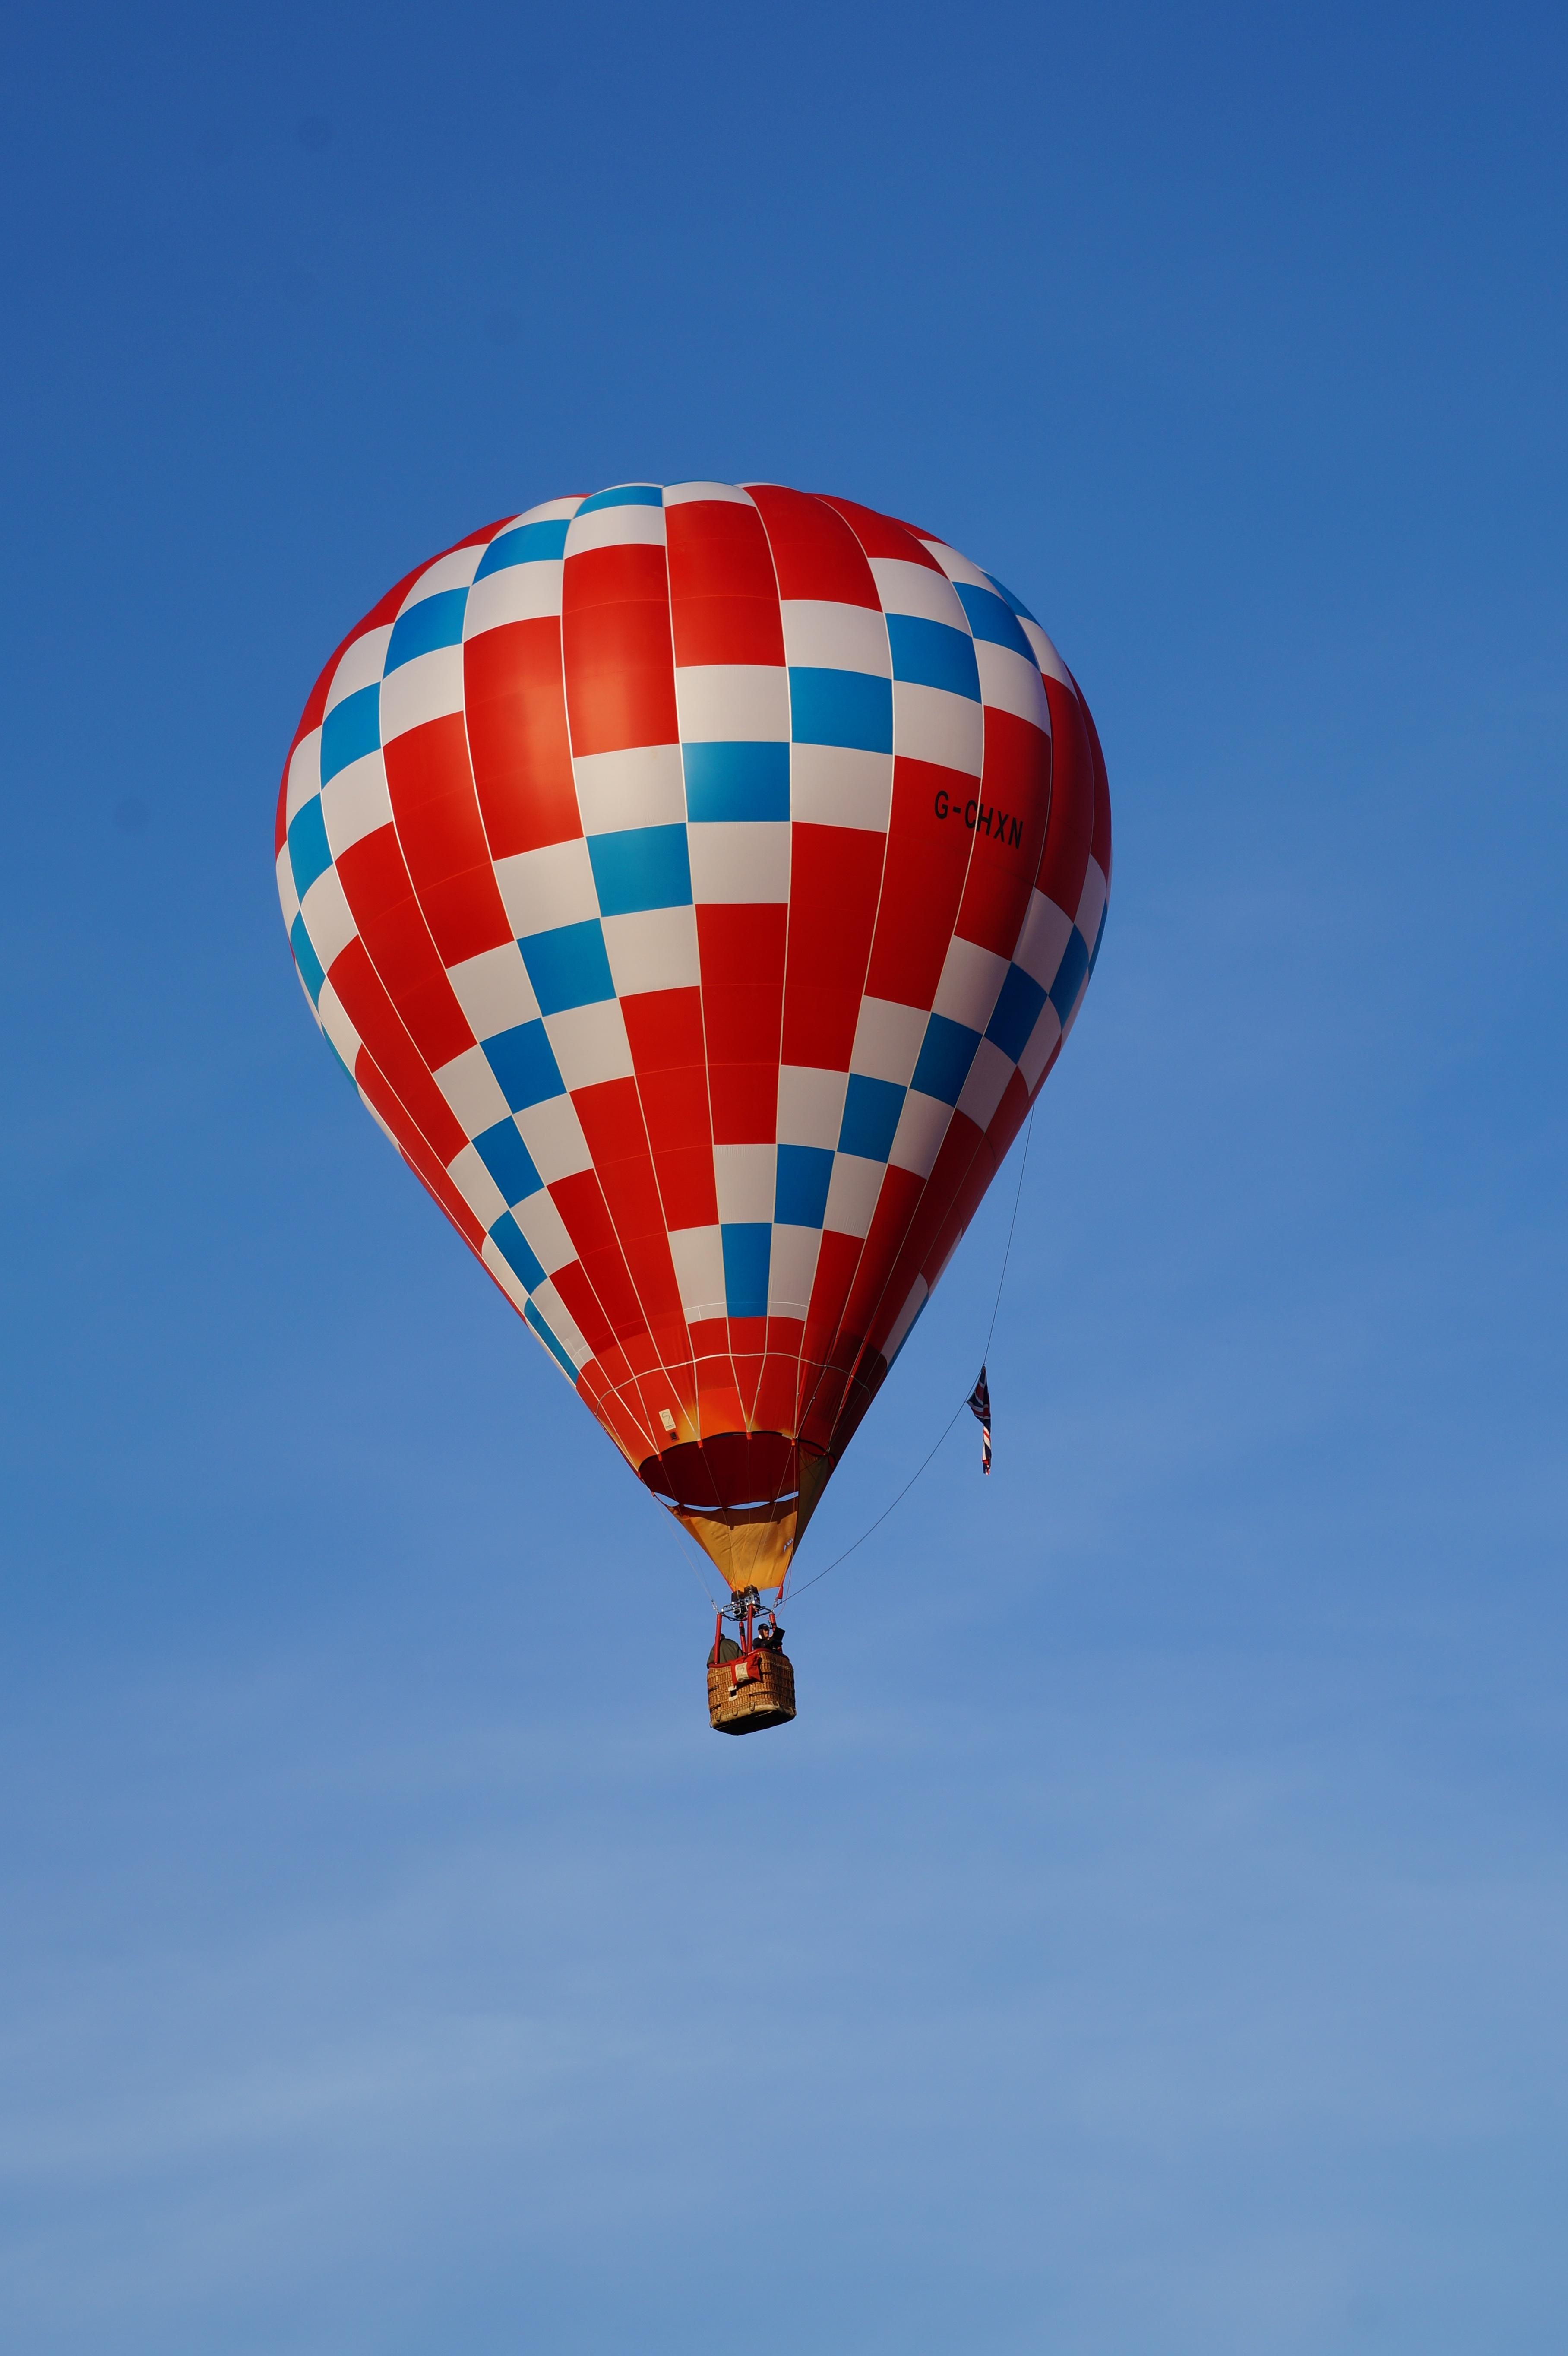 Fotos gratis : ala, cielo, globo aerostático, verano ...